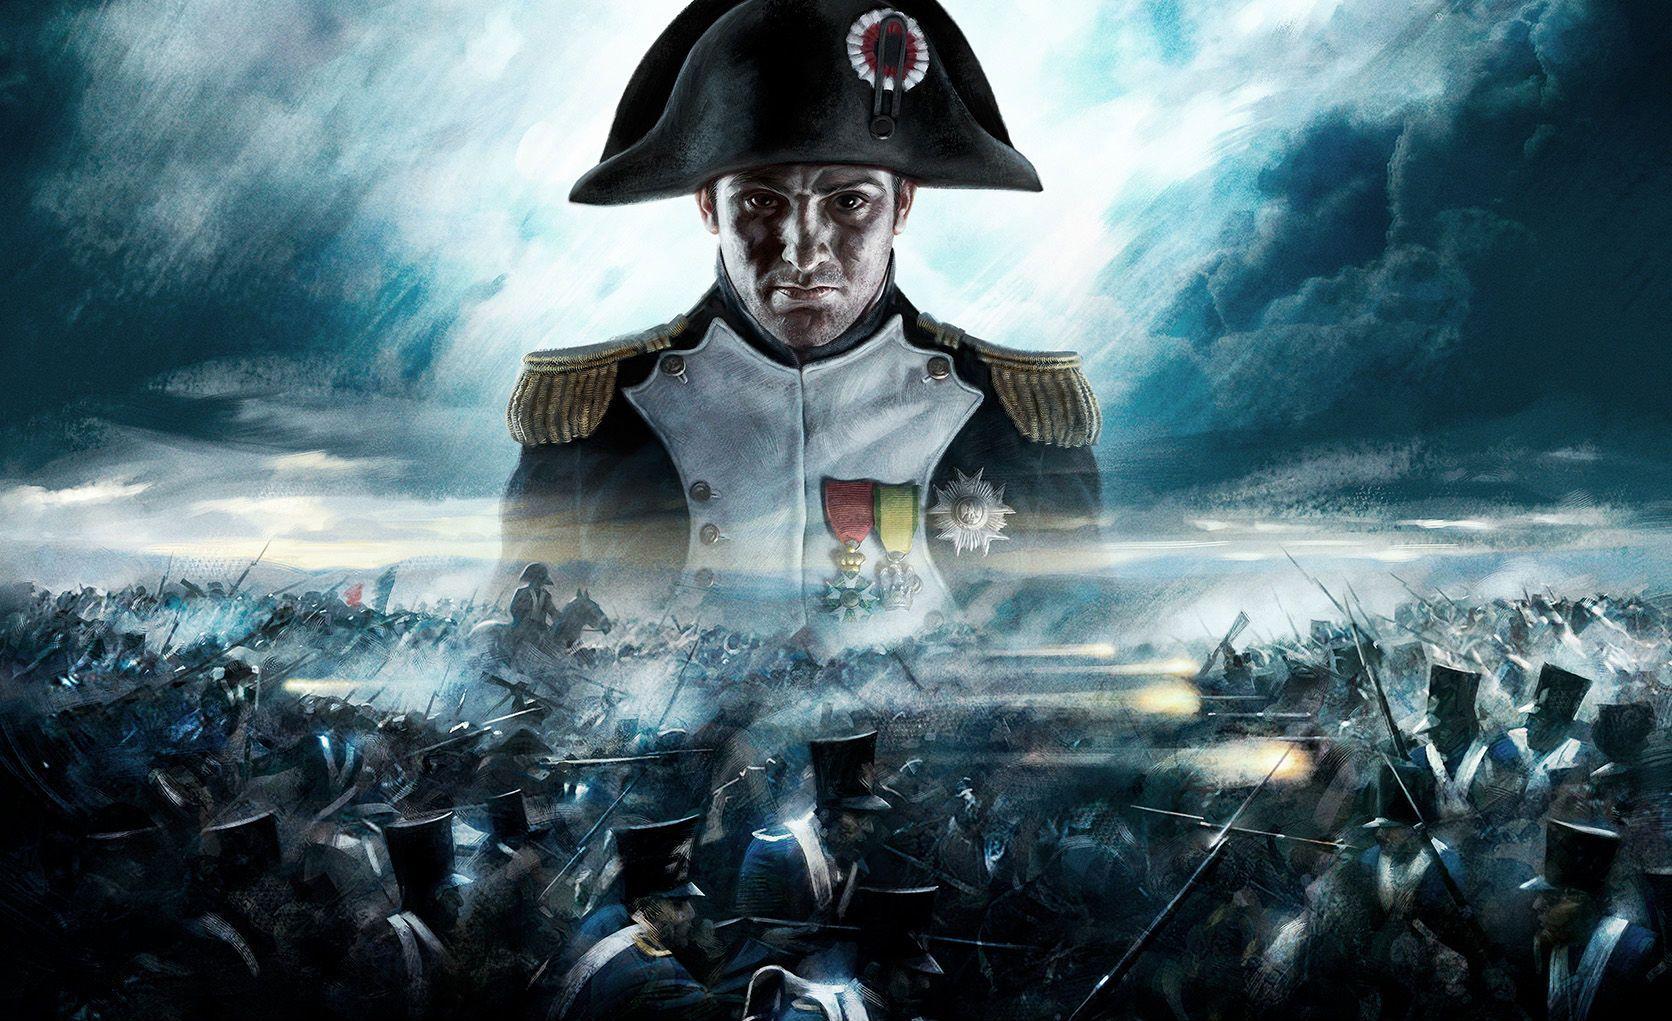 Napoleon Total War Art With Images War Art Empire Total War